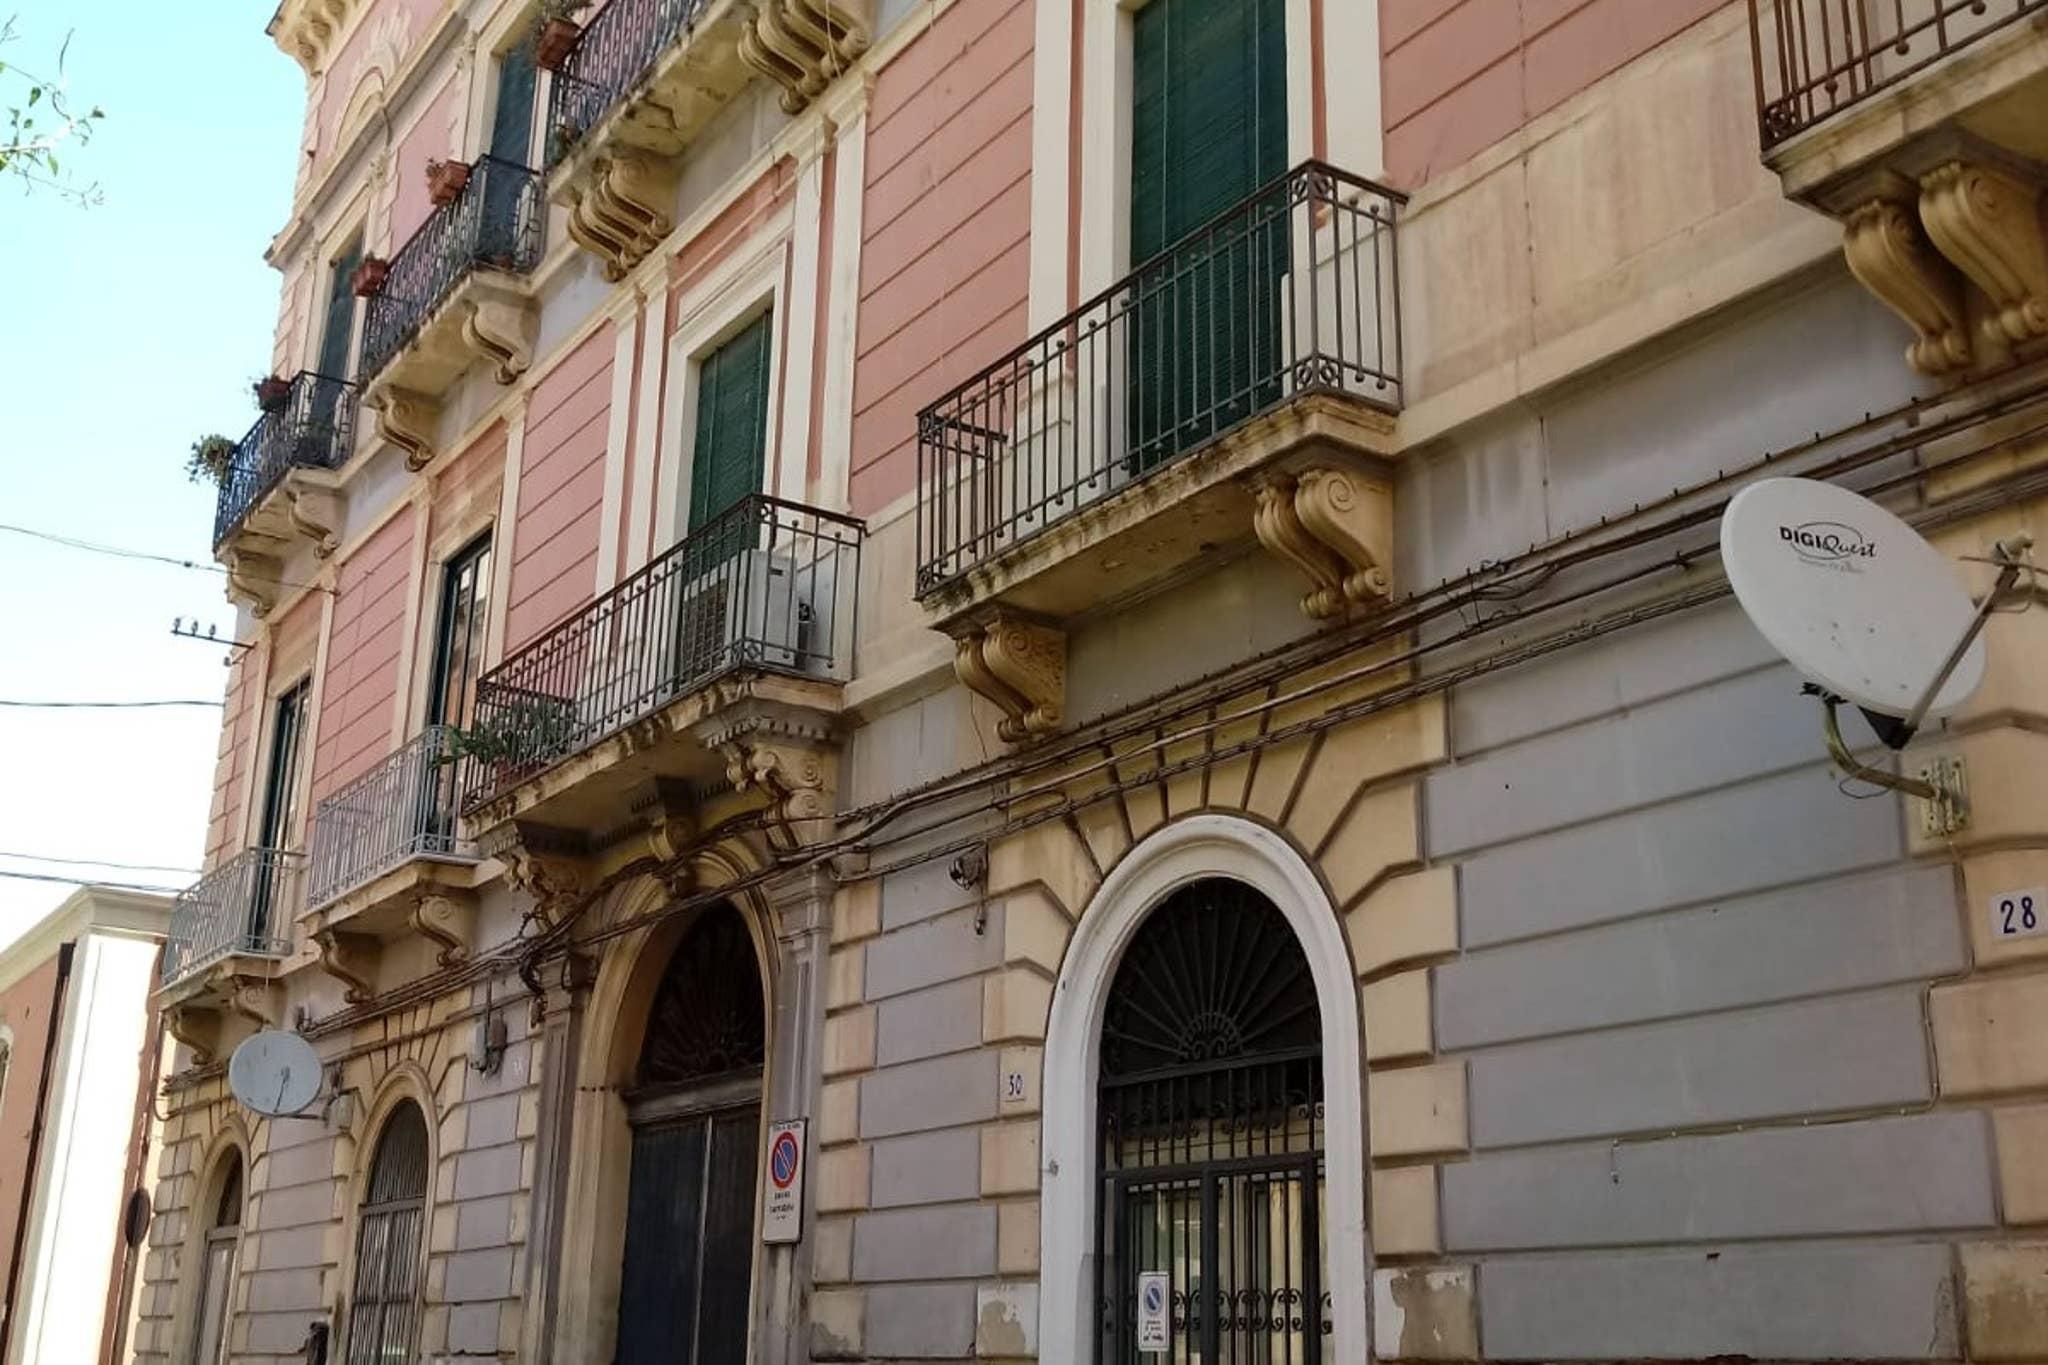 Maison de vacances  (2782175), Catania, Catania, Sicile, Italie, image 24